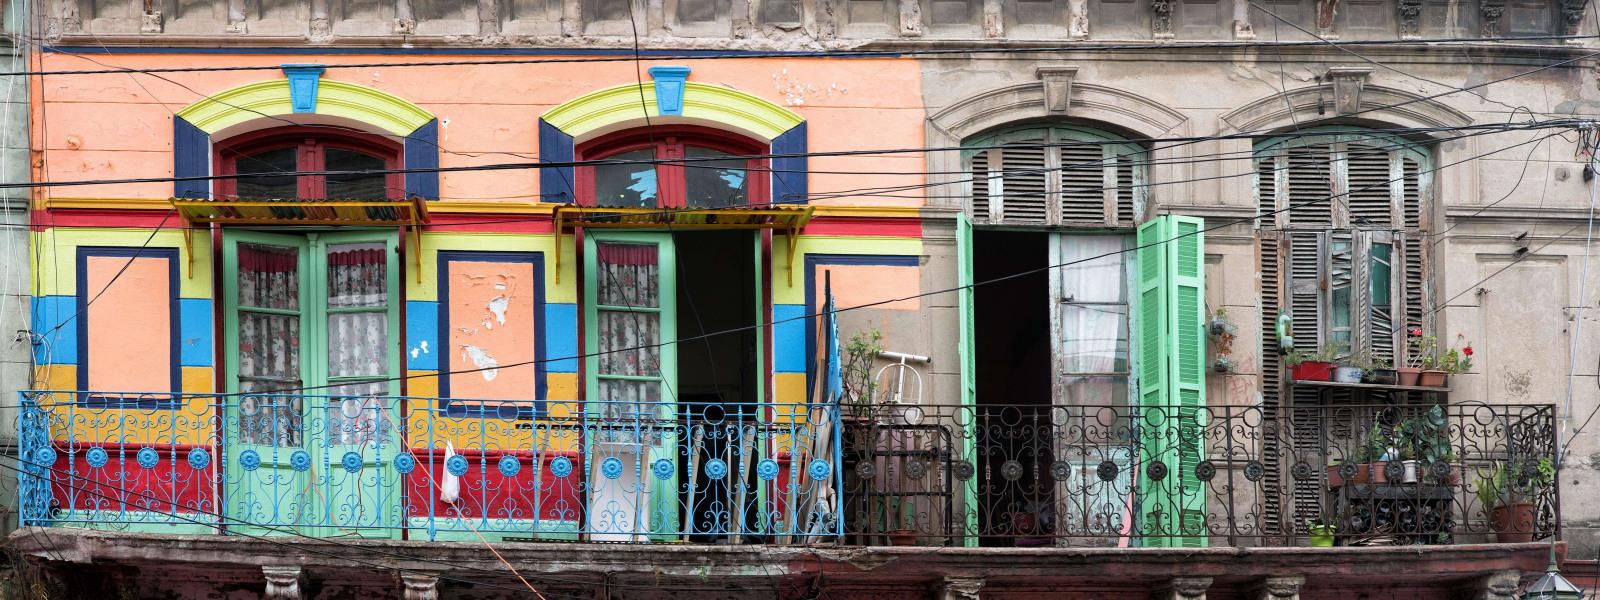 BuenosAires-Tour-Guide